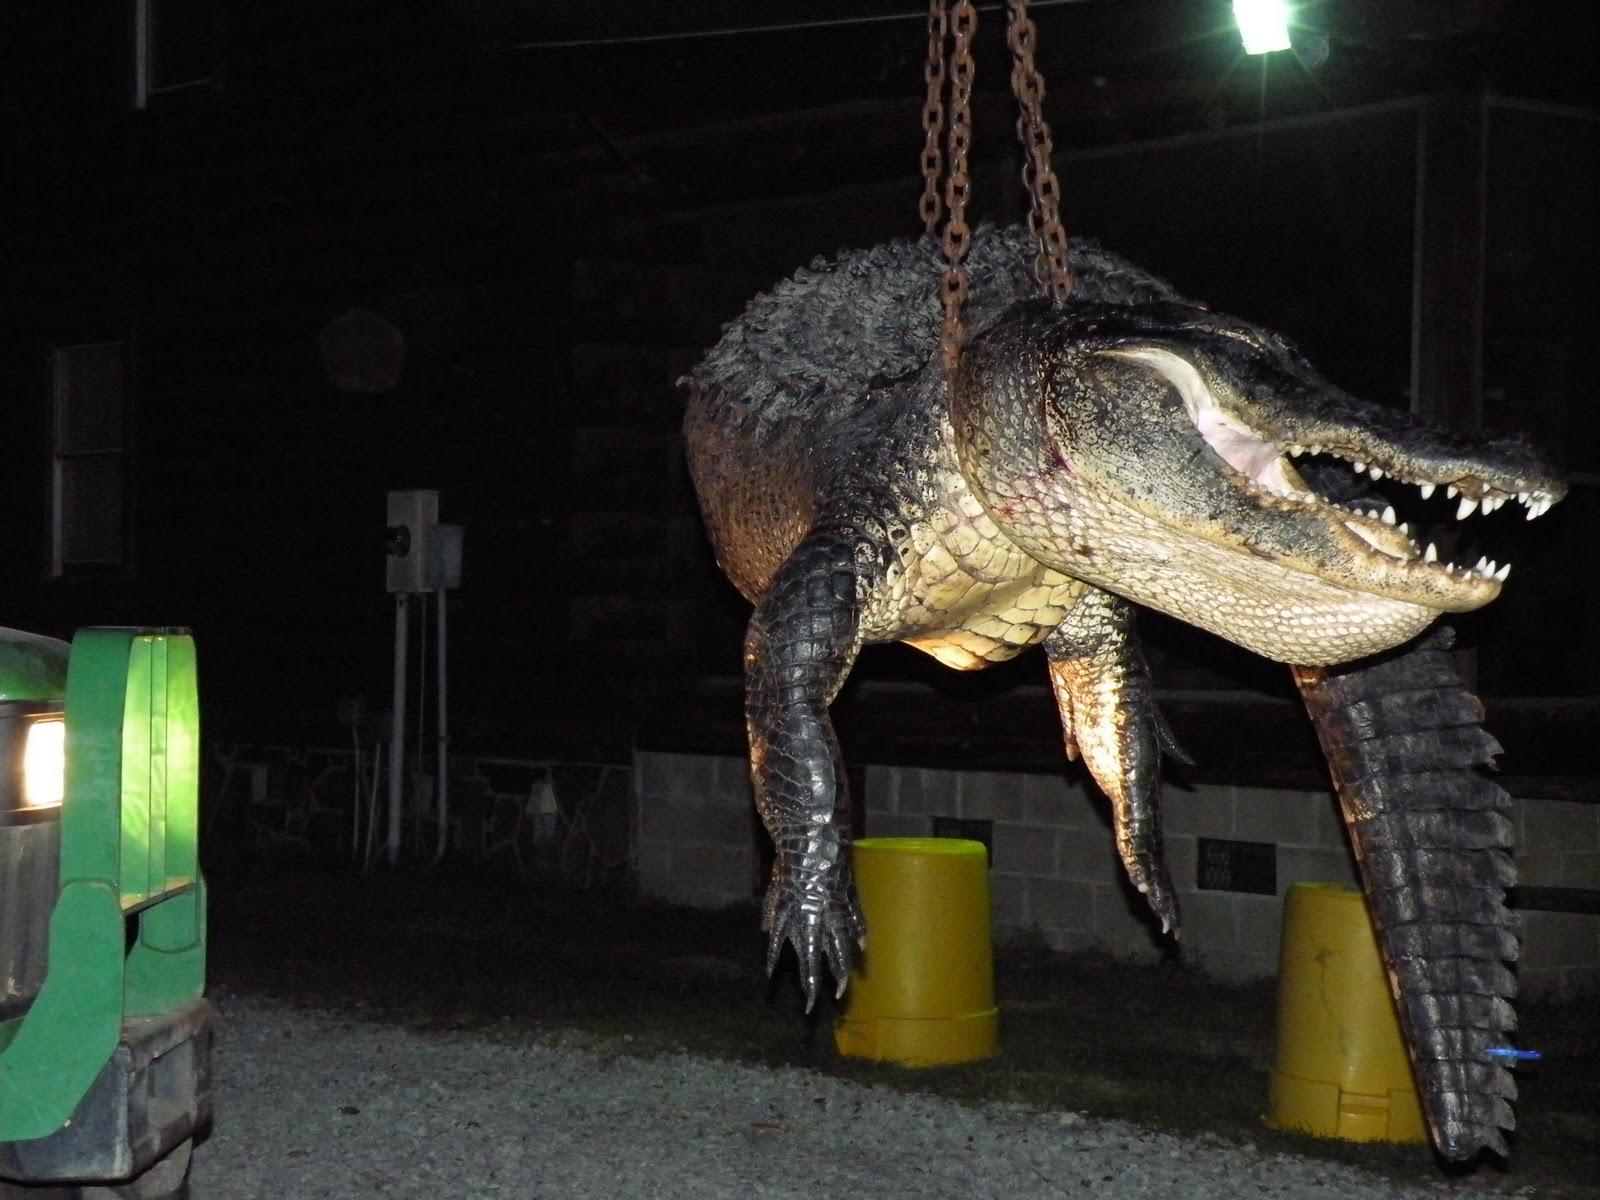 Cordray's: Stanton Gragg brought in a big bull gator!